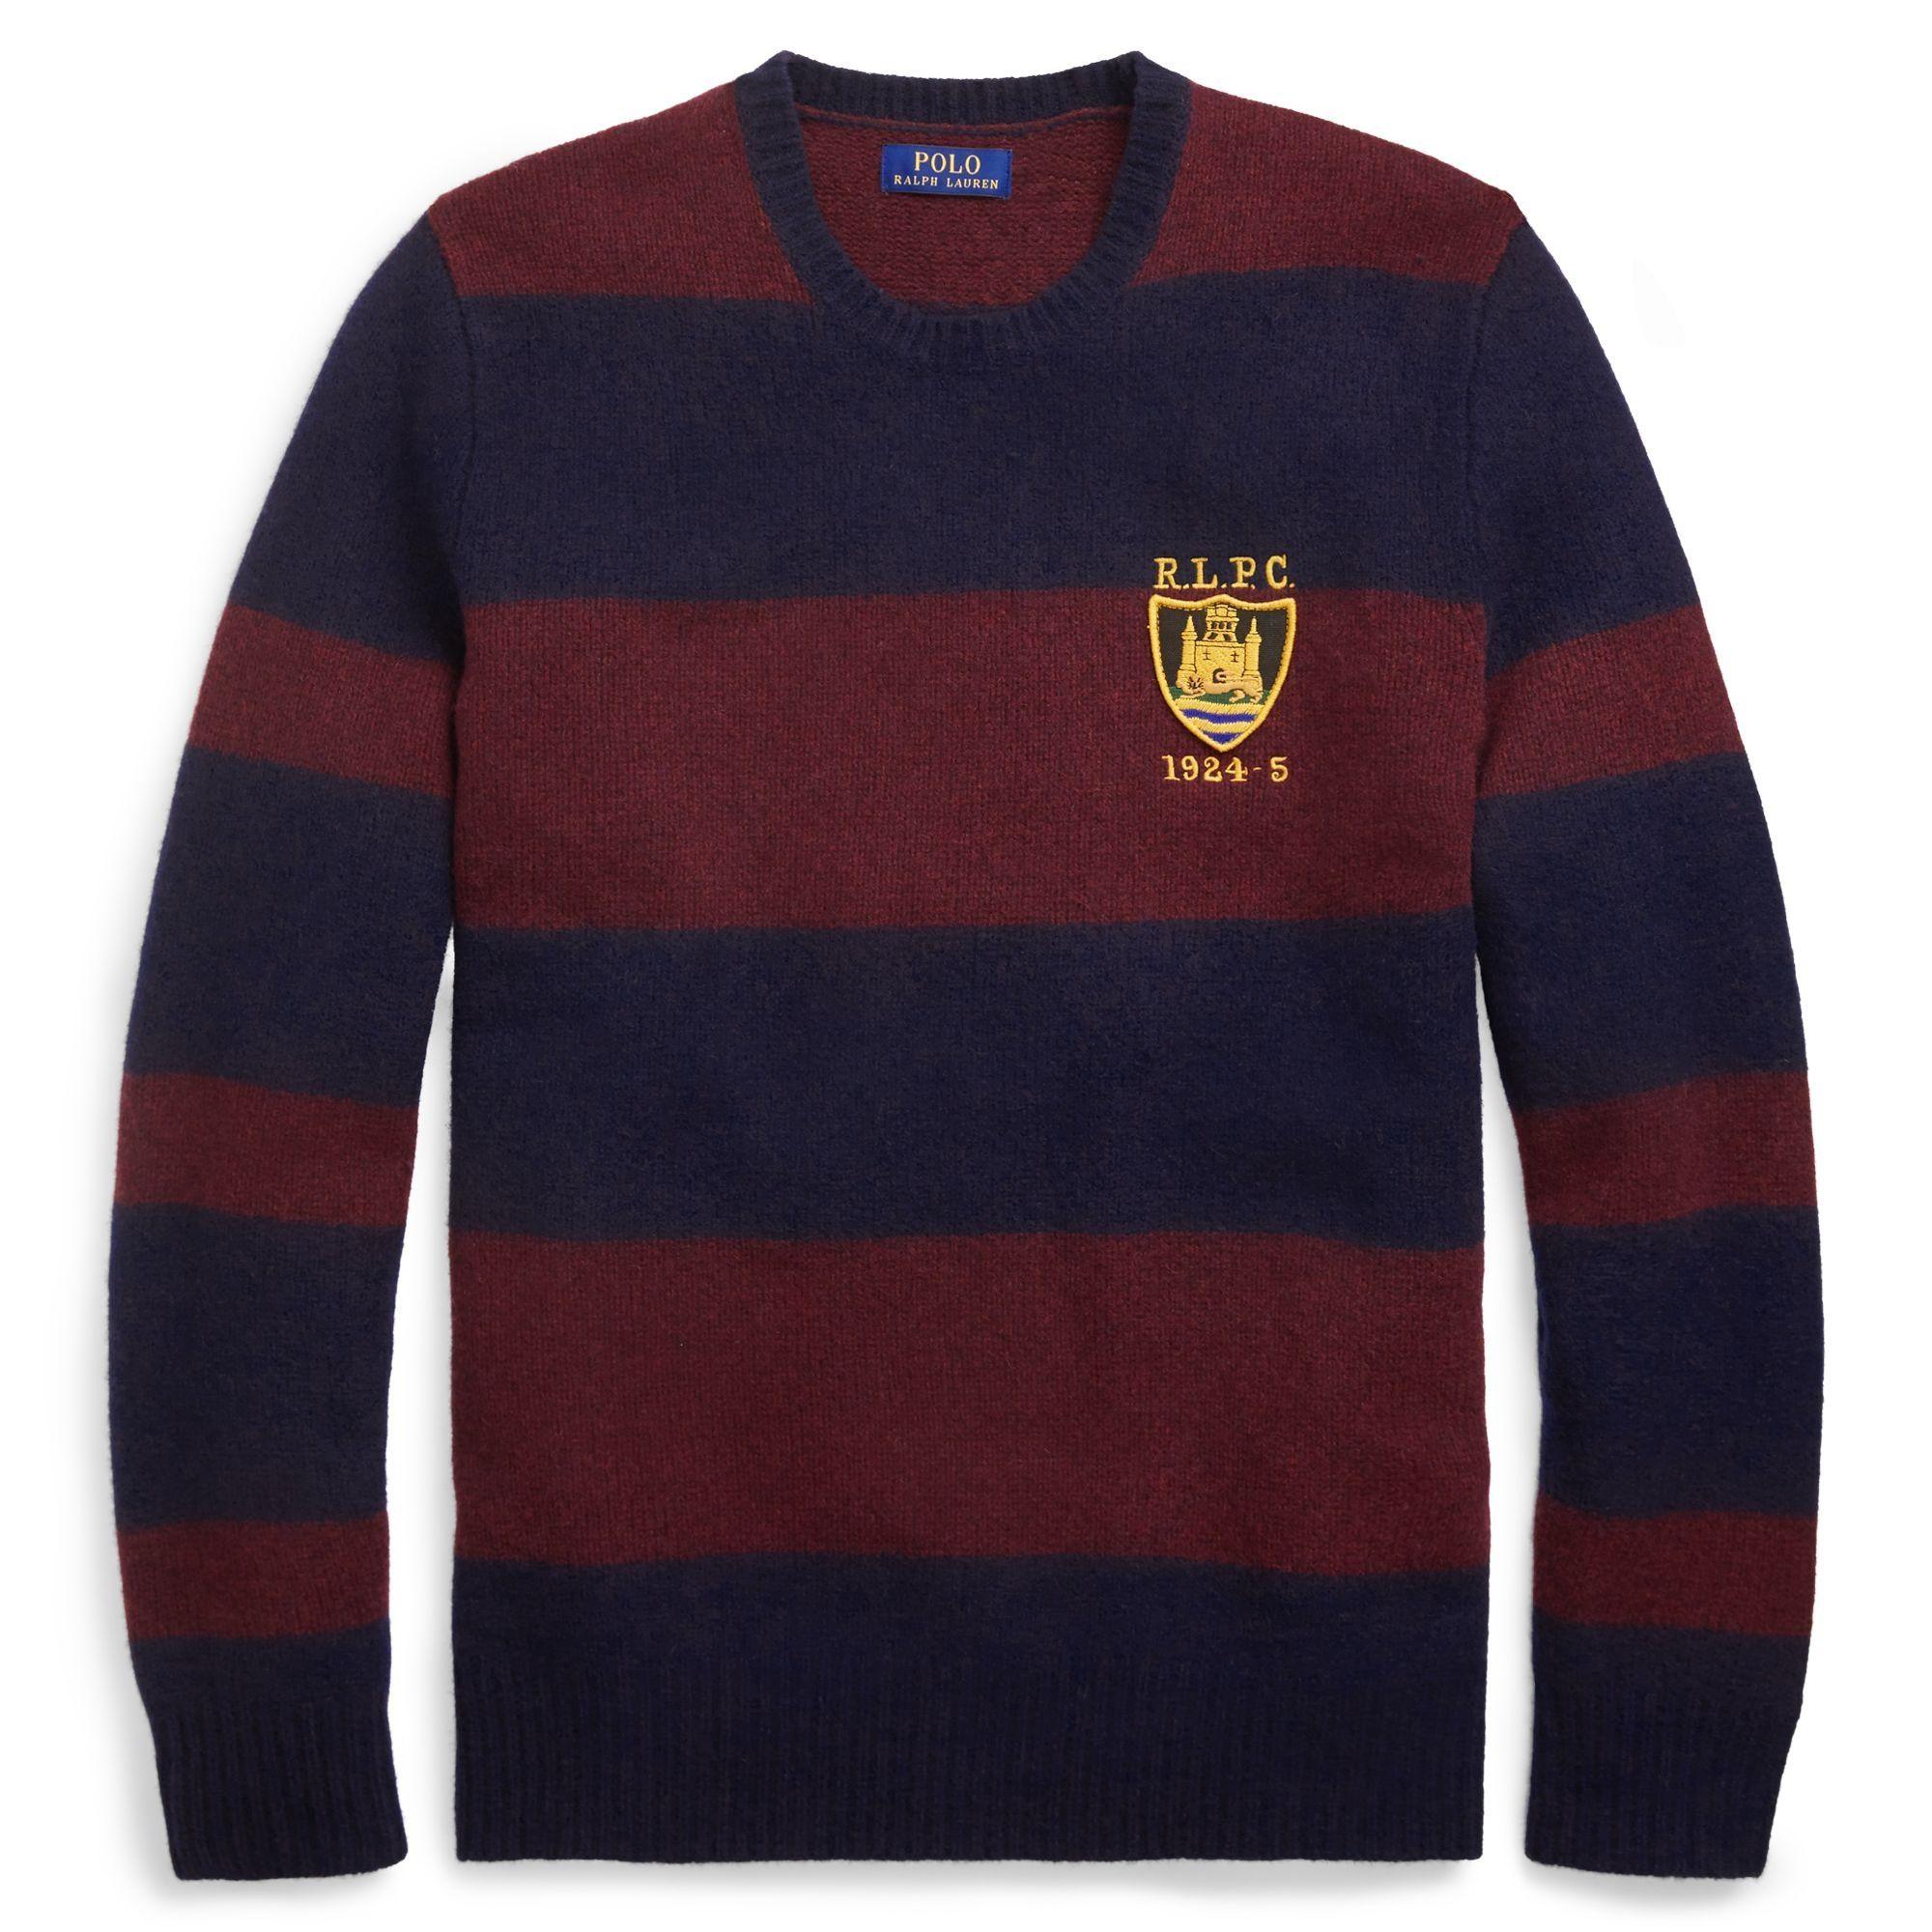 81cd3680 Polo Ralph Lauren Striped Merino Wool Sweater | Jackets & Coats ...